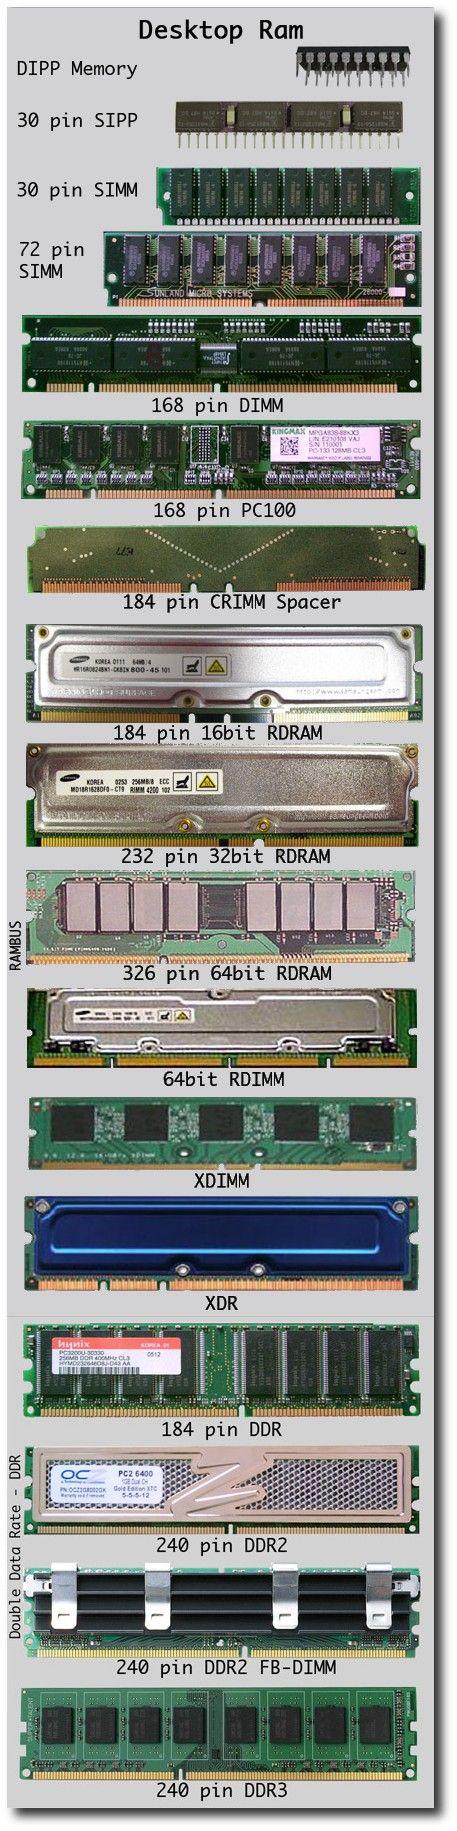 Computer Hardware Chart Desktop Ram Computer Hardware Desktop Ram Computer Technology